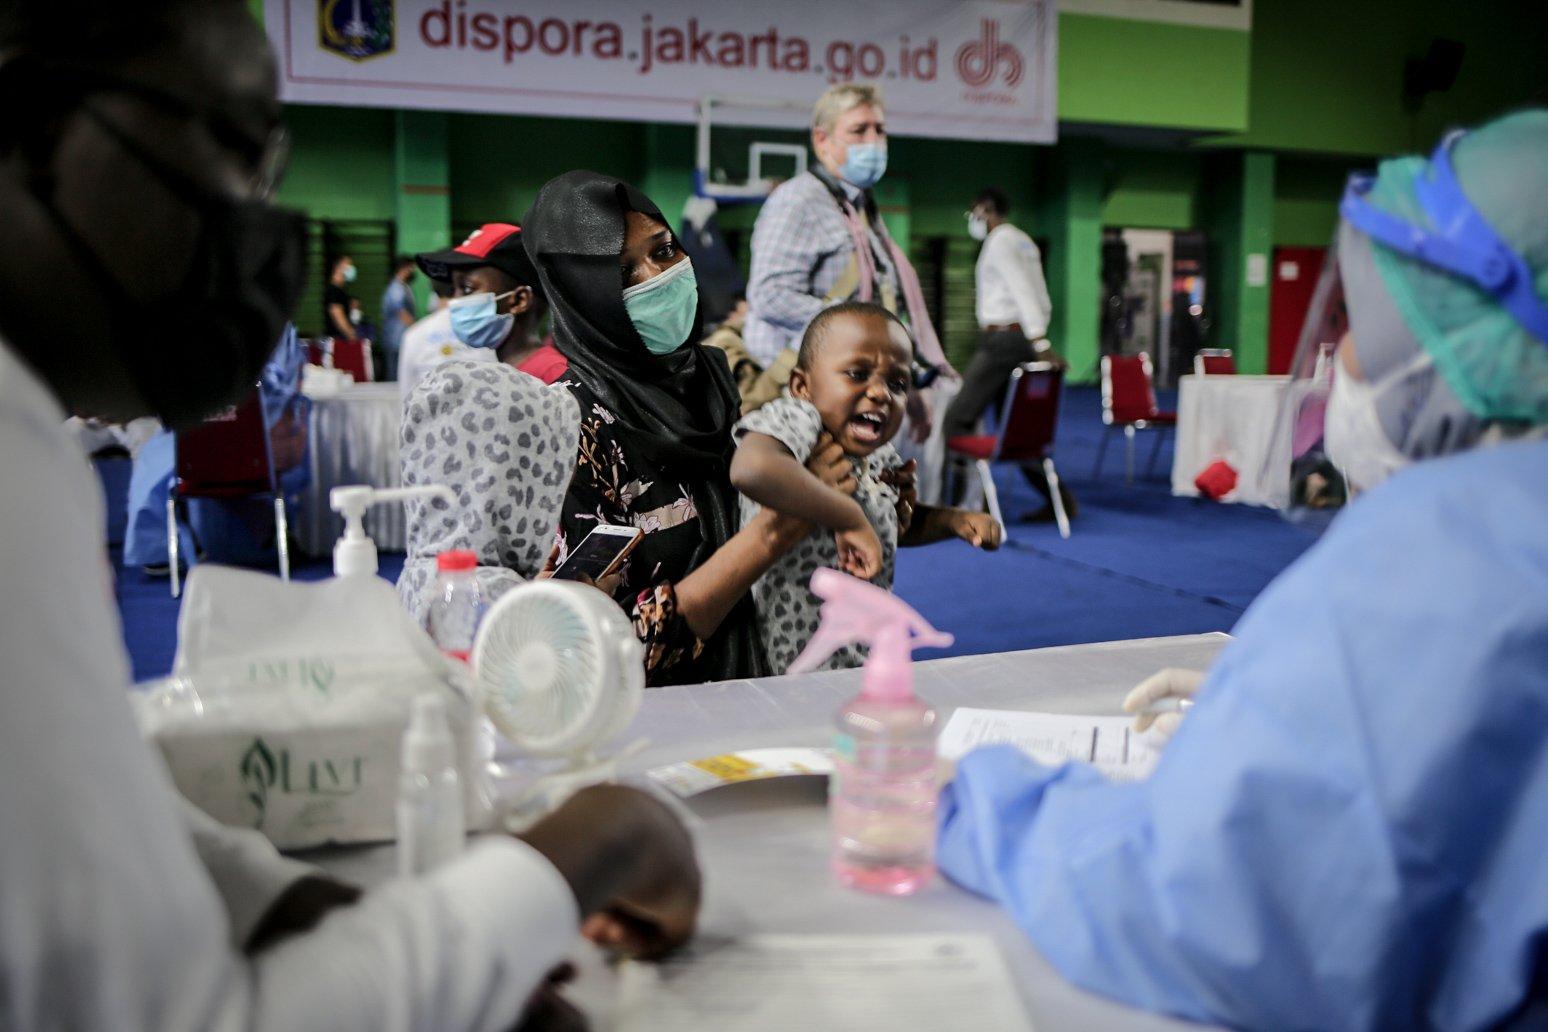 Para pencari suaka menggendong anaknya saat mengikuti vaksinasi COVID-19 di GOR Bulungan, Jakarta Selatan, Kamis (7/10/2021). \r\nVaksinasi tersebut digelar atas kerja sama Pemprov DKI Jakarta, UNHCR dan Kadin Indonesia. \r\nSebanyak 600 vaksin dosis pertama disediakan dalam vaksinasi tersebut.